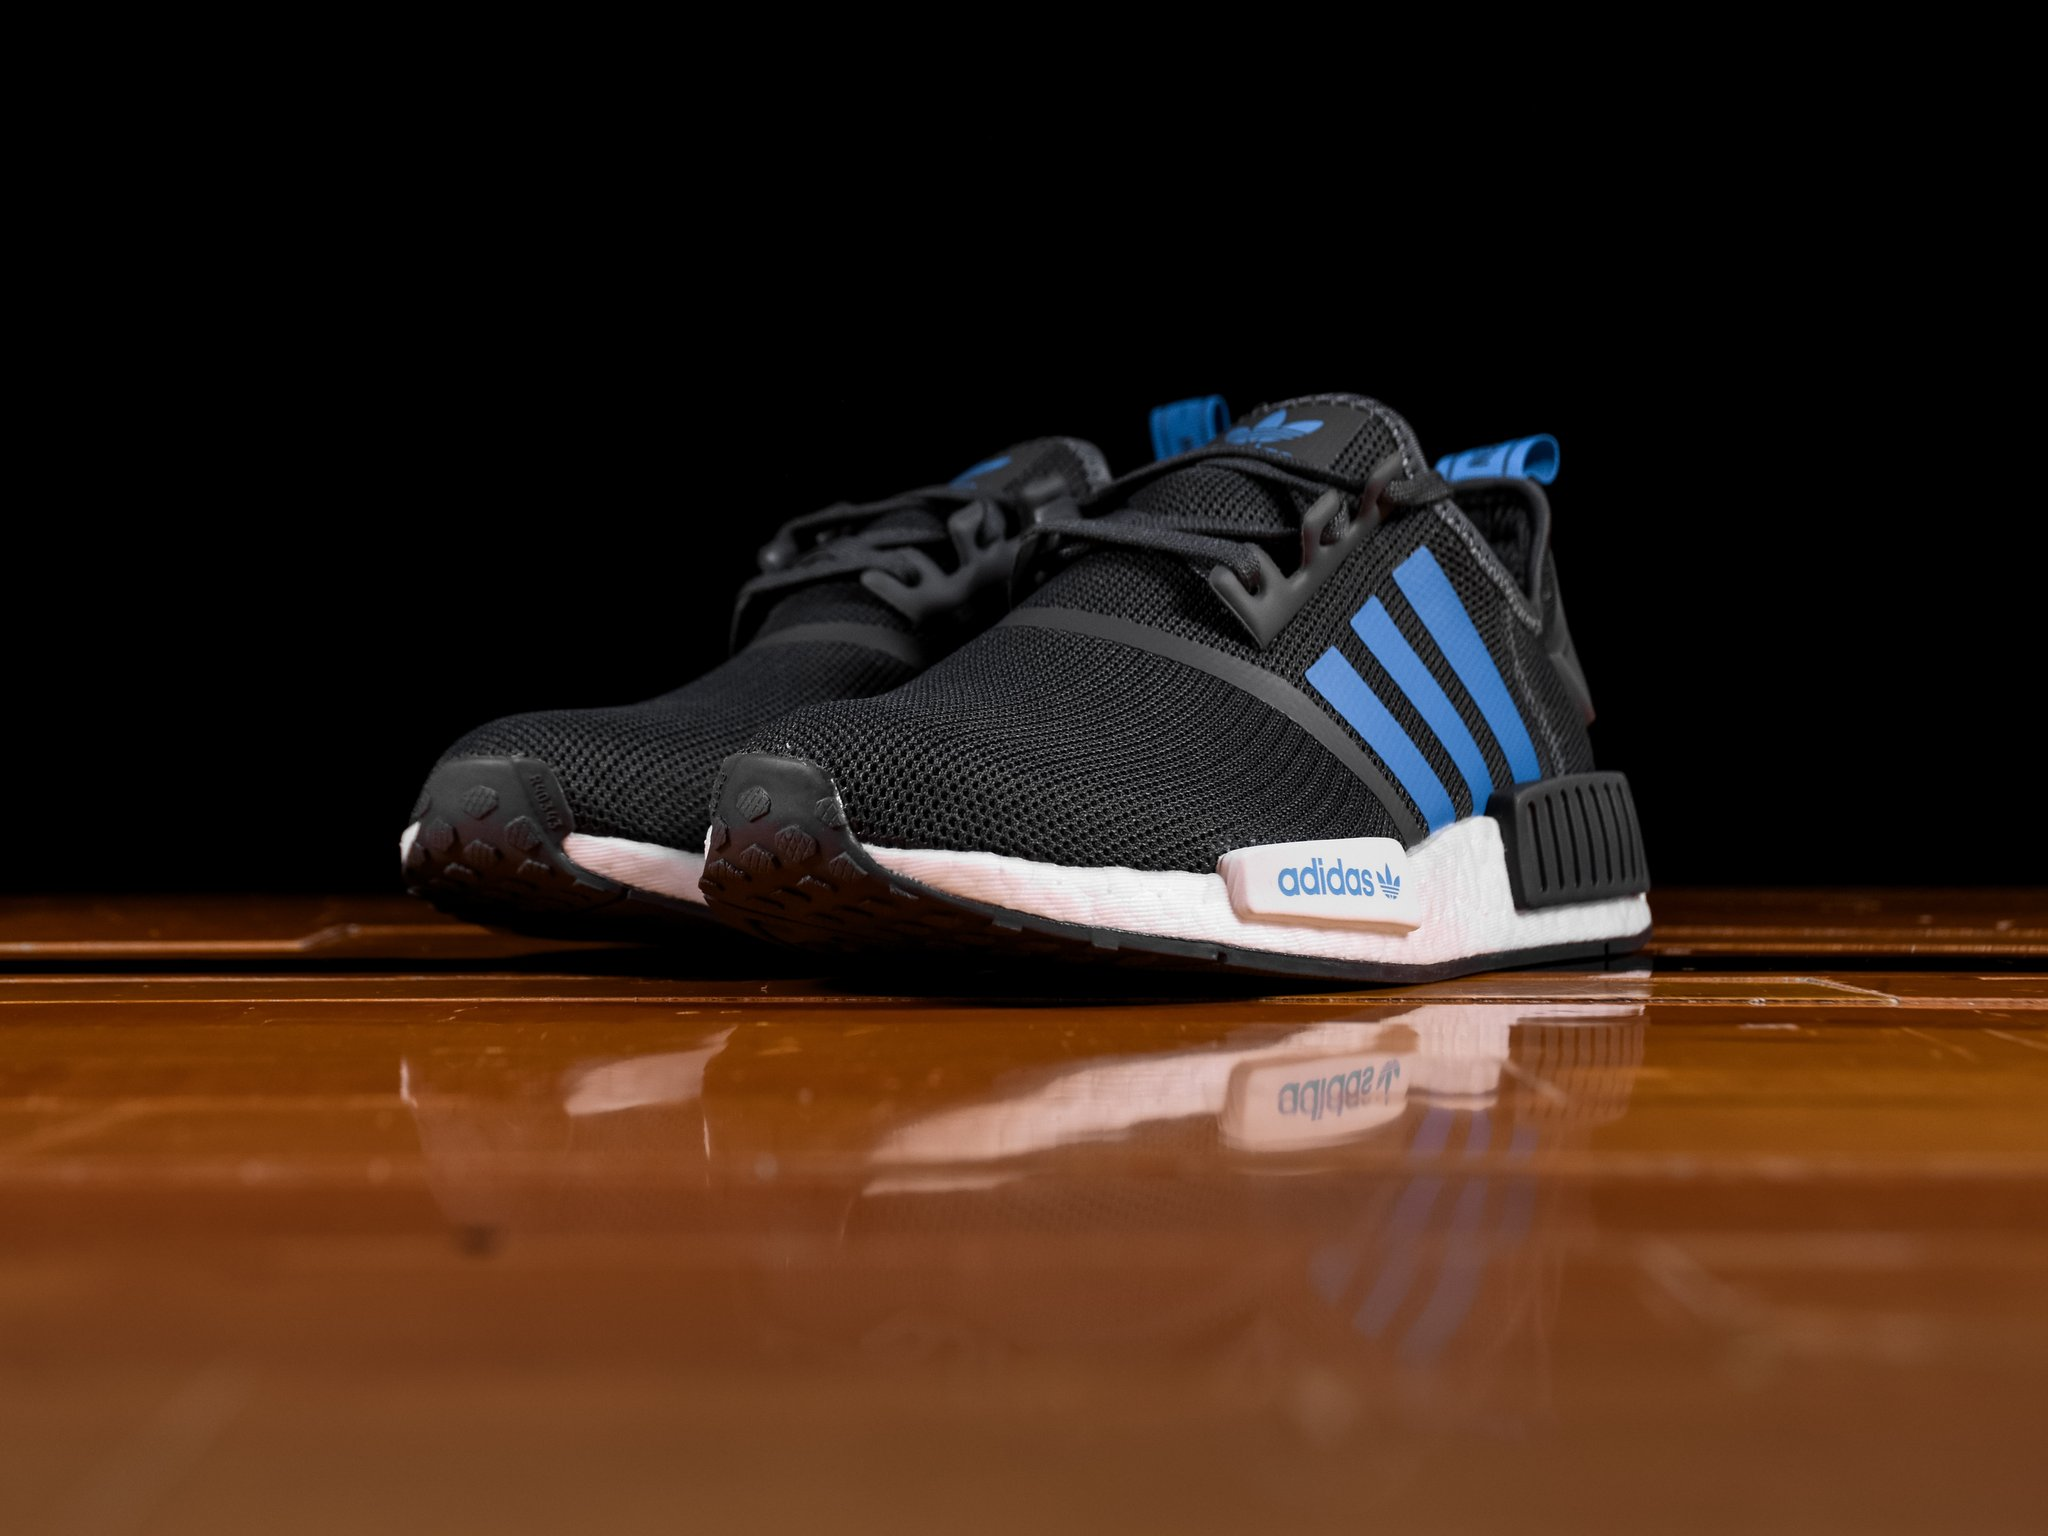 KUMO SHOES-Adidas NMD R1 Boost 深灰藍 網布 編織 黑藍 慢跑鞋 女鞋 D96688